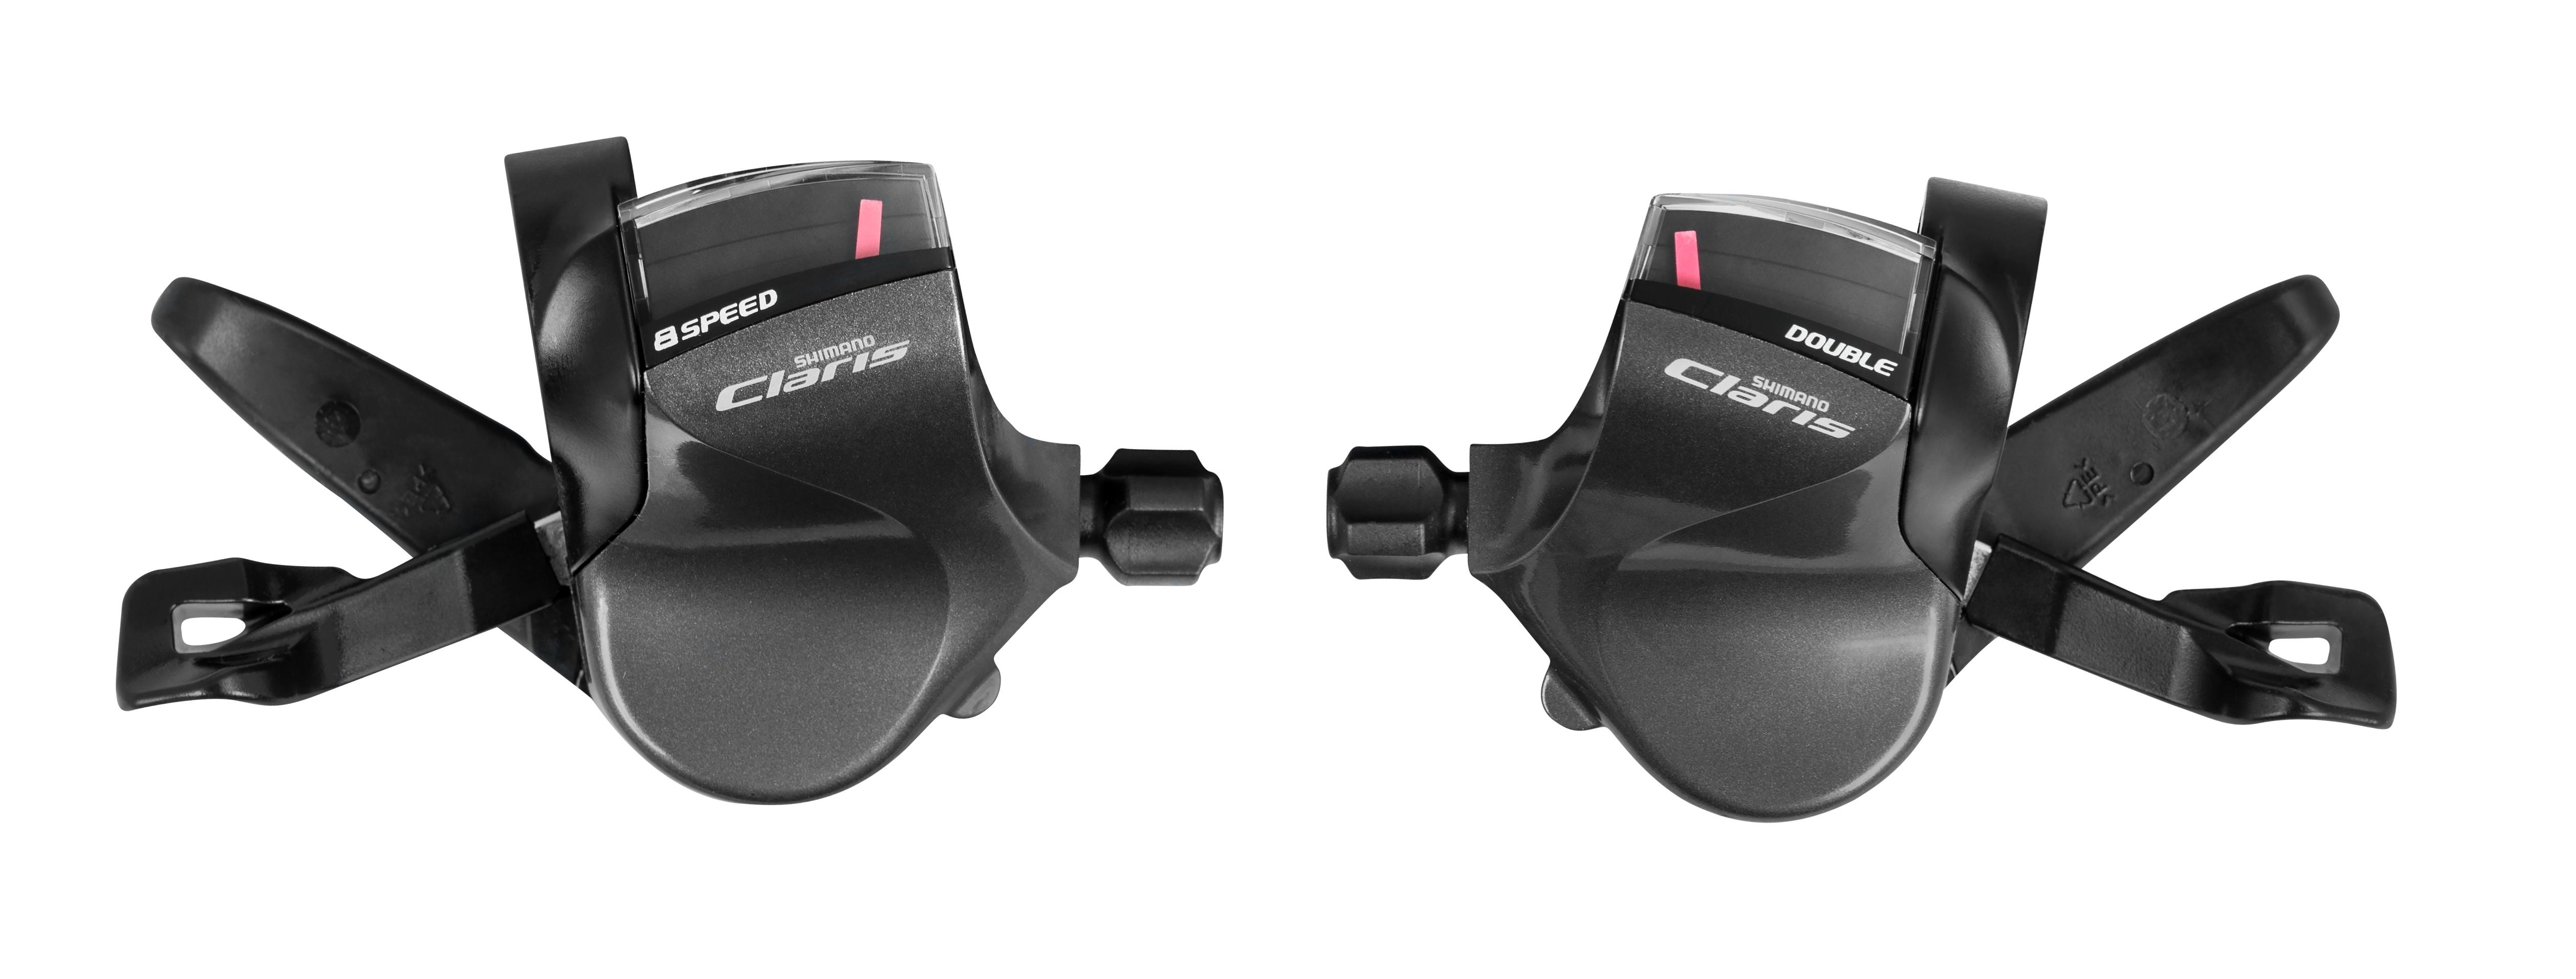 řadící páčky CLARIS SLR2000RA+RB 8x2